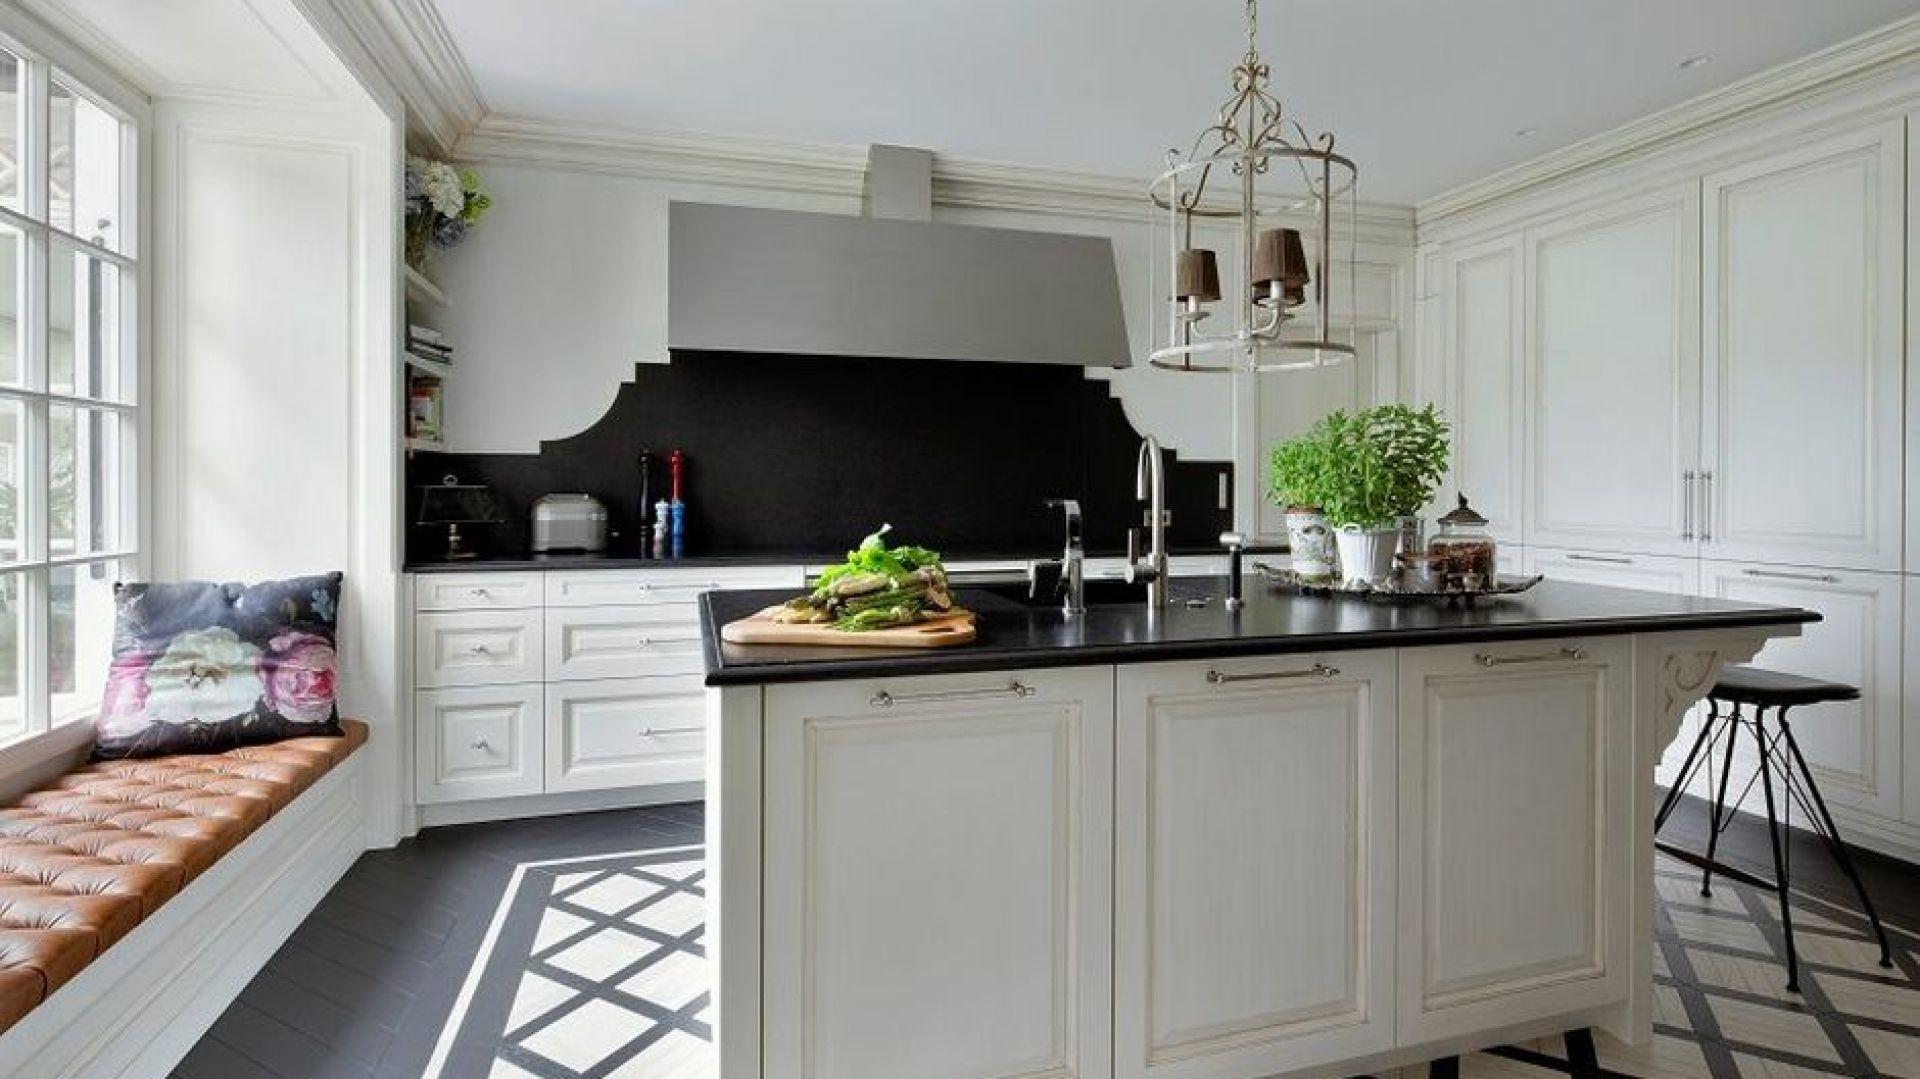 KitchenDesignOver£100000_WyzyrkowskiStudio_WhiterShadeofProvance_3-891x594.jpg